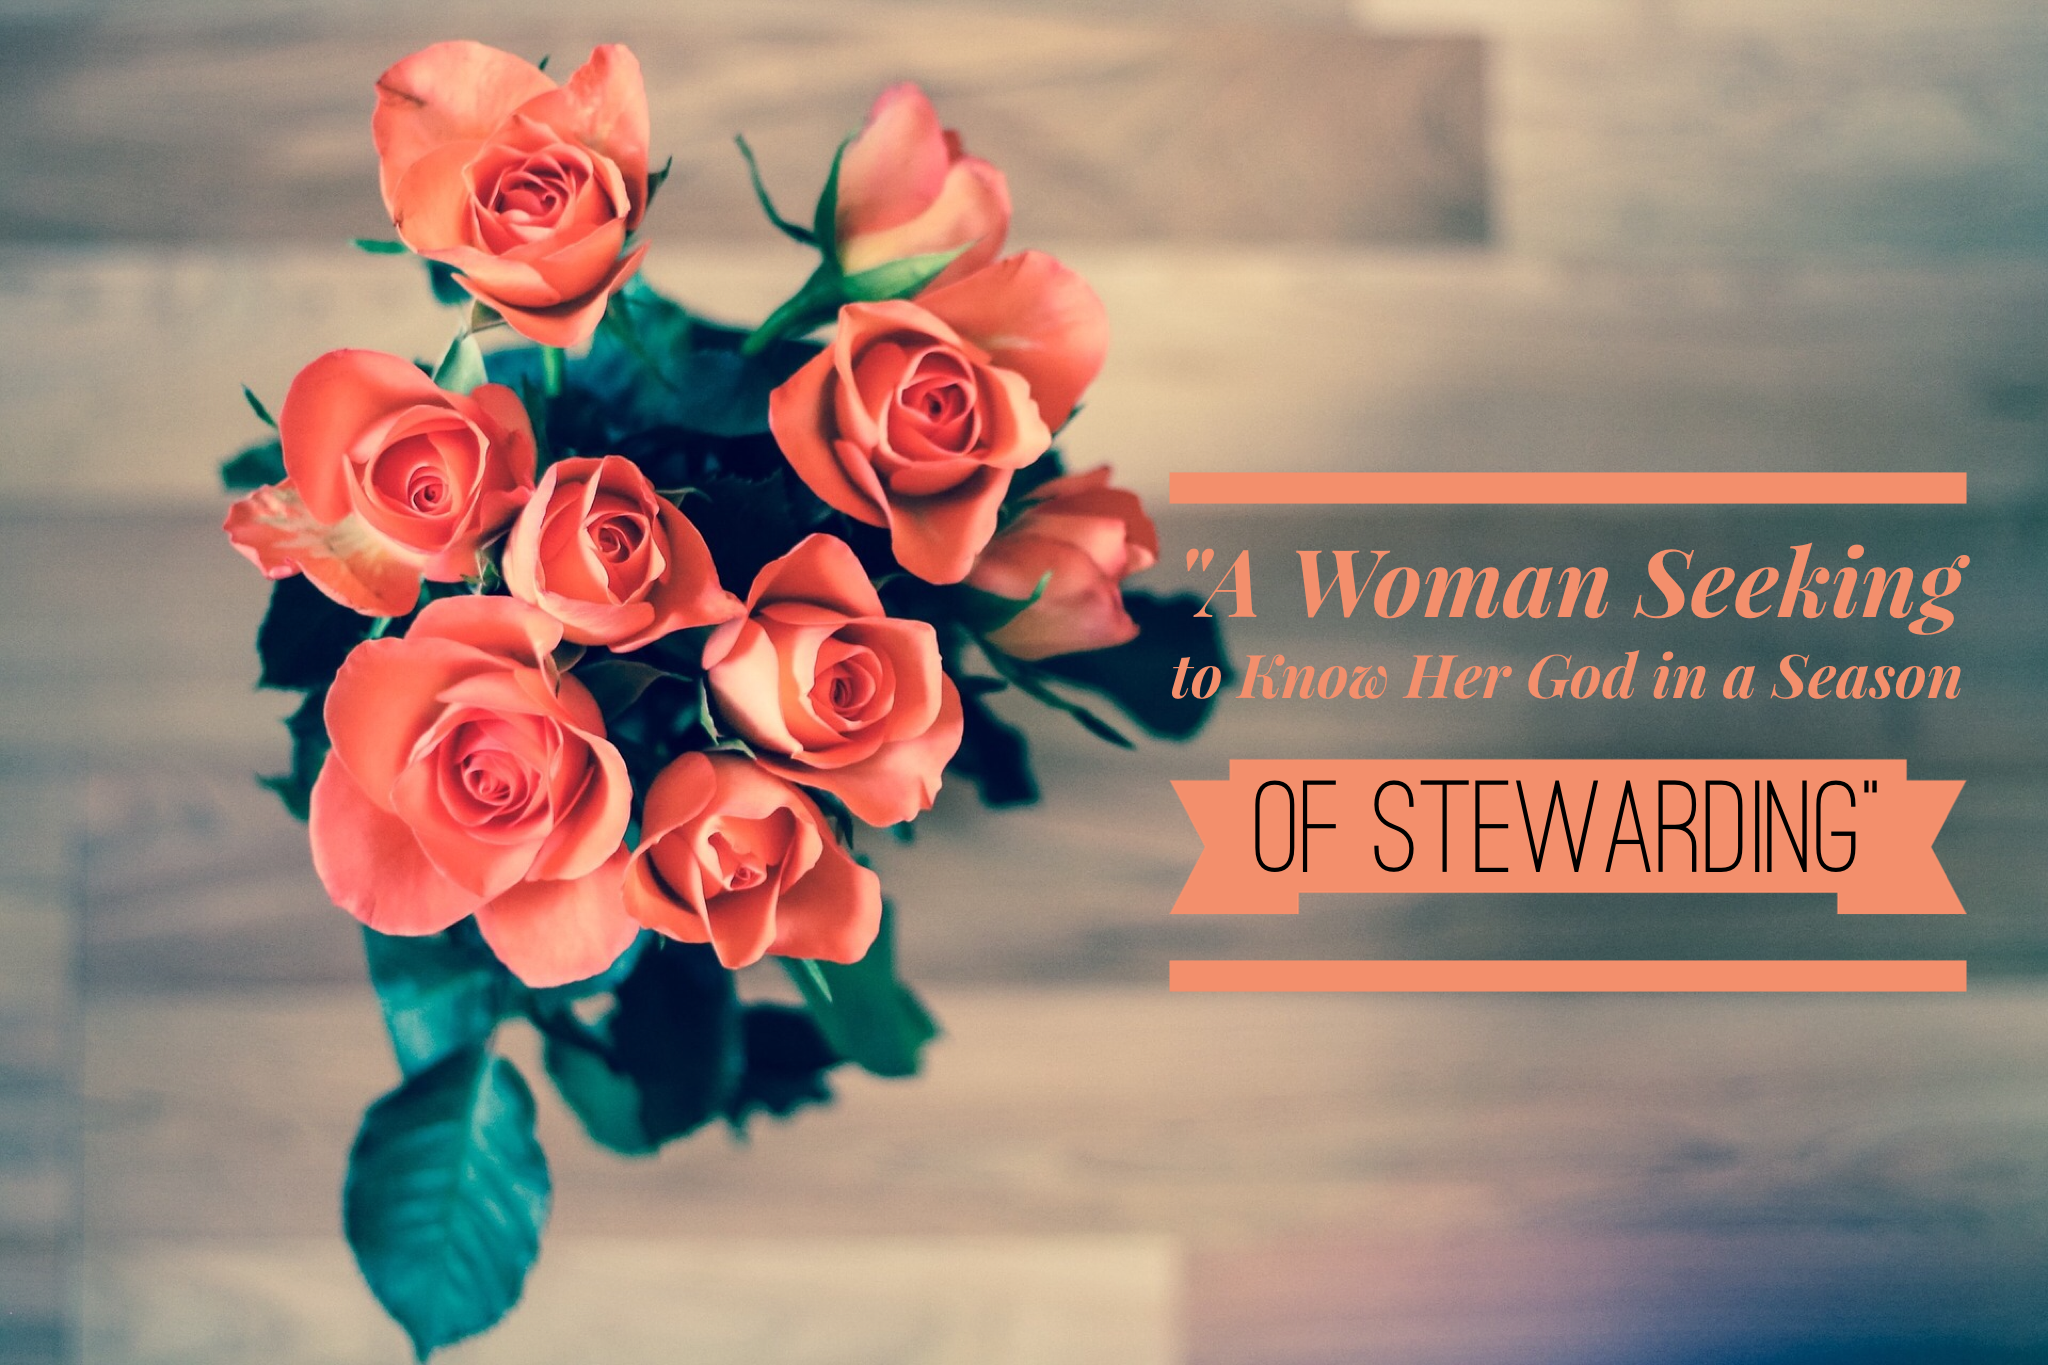 A Woman Seeking to Know Her God in a Season of Stewarding | www.codyandras.com/2017/9/6/a-woman-seeking-to-know-her-god-in-a-season-of-stewarding